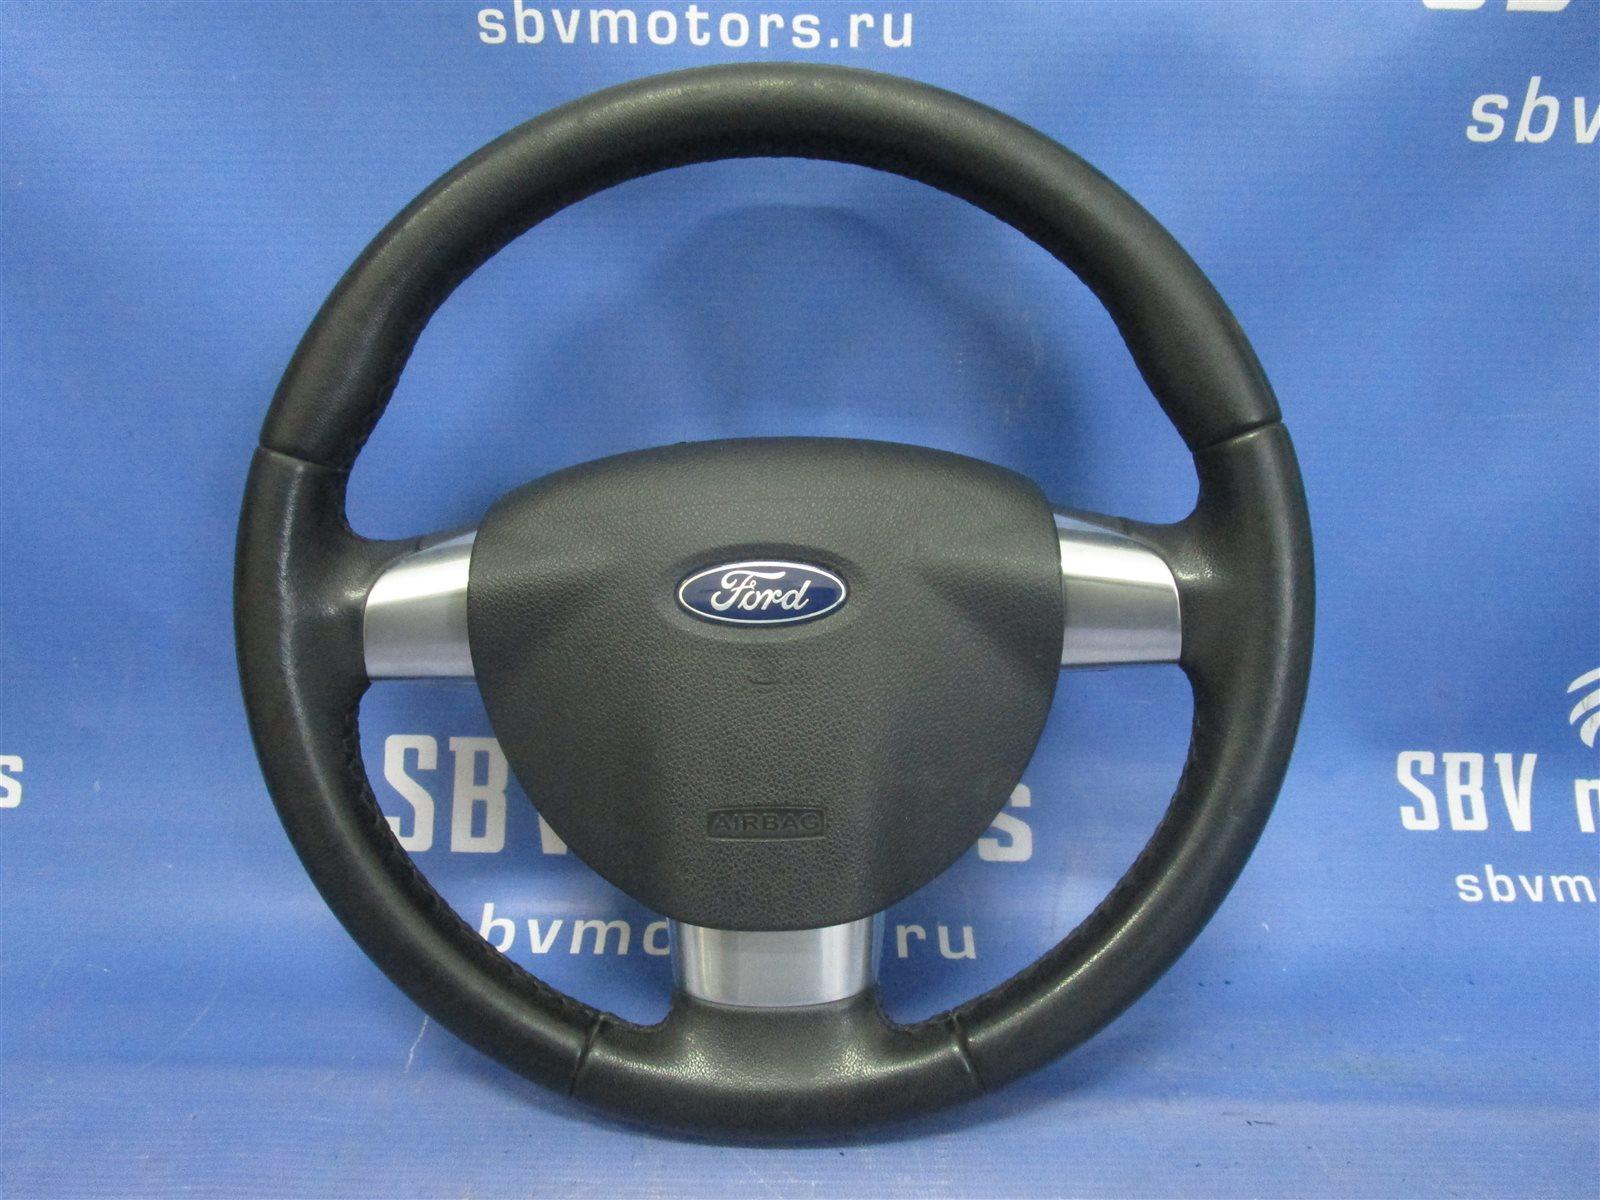 Руль Ford Focus HATCH SHDA 1.6 DURATEС 100 ЛС 2009г.